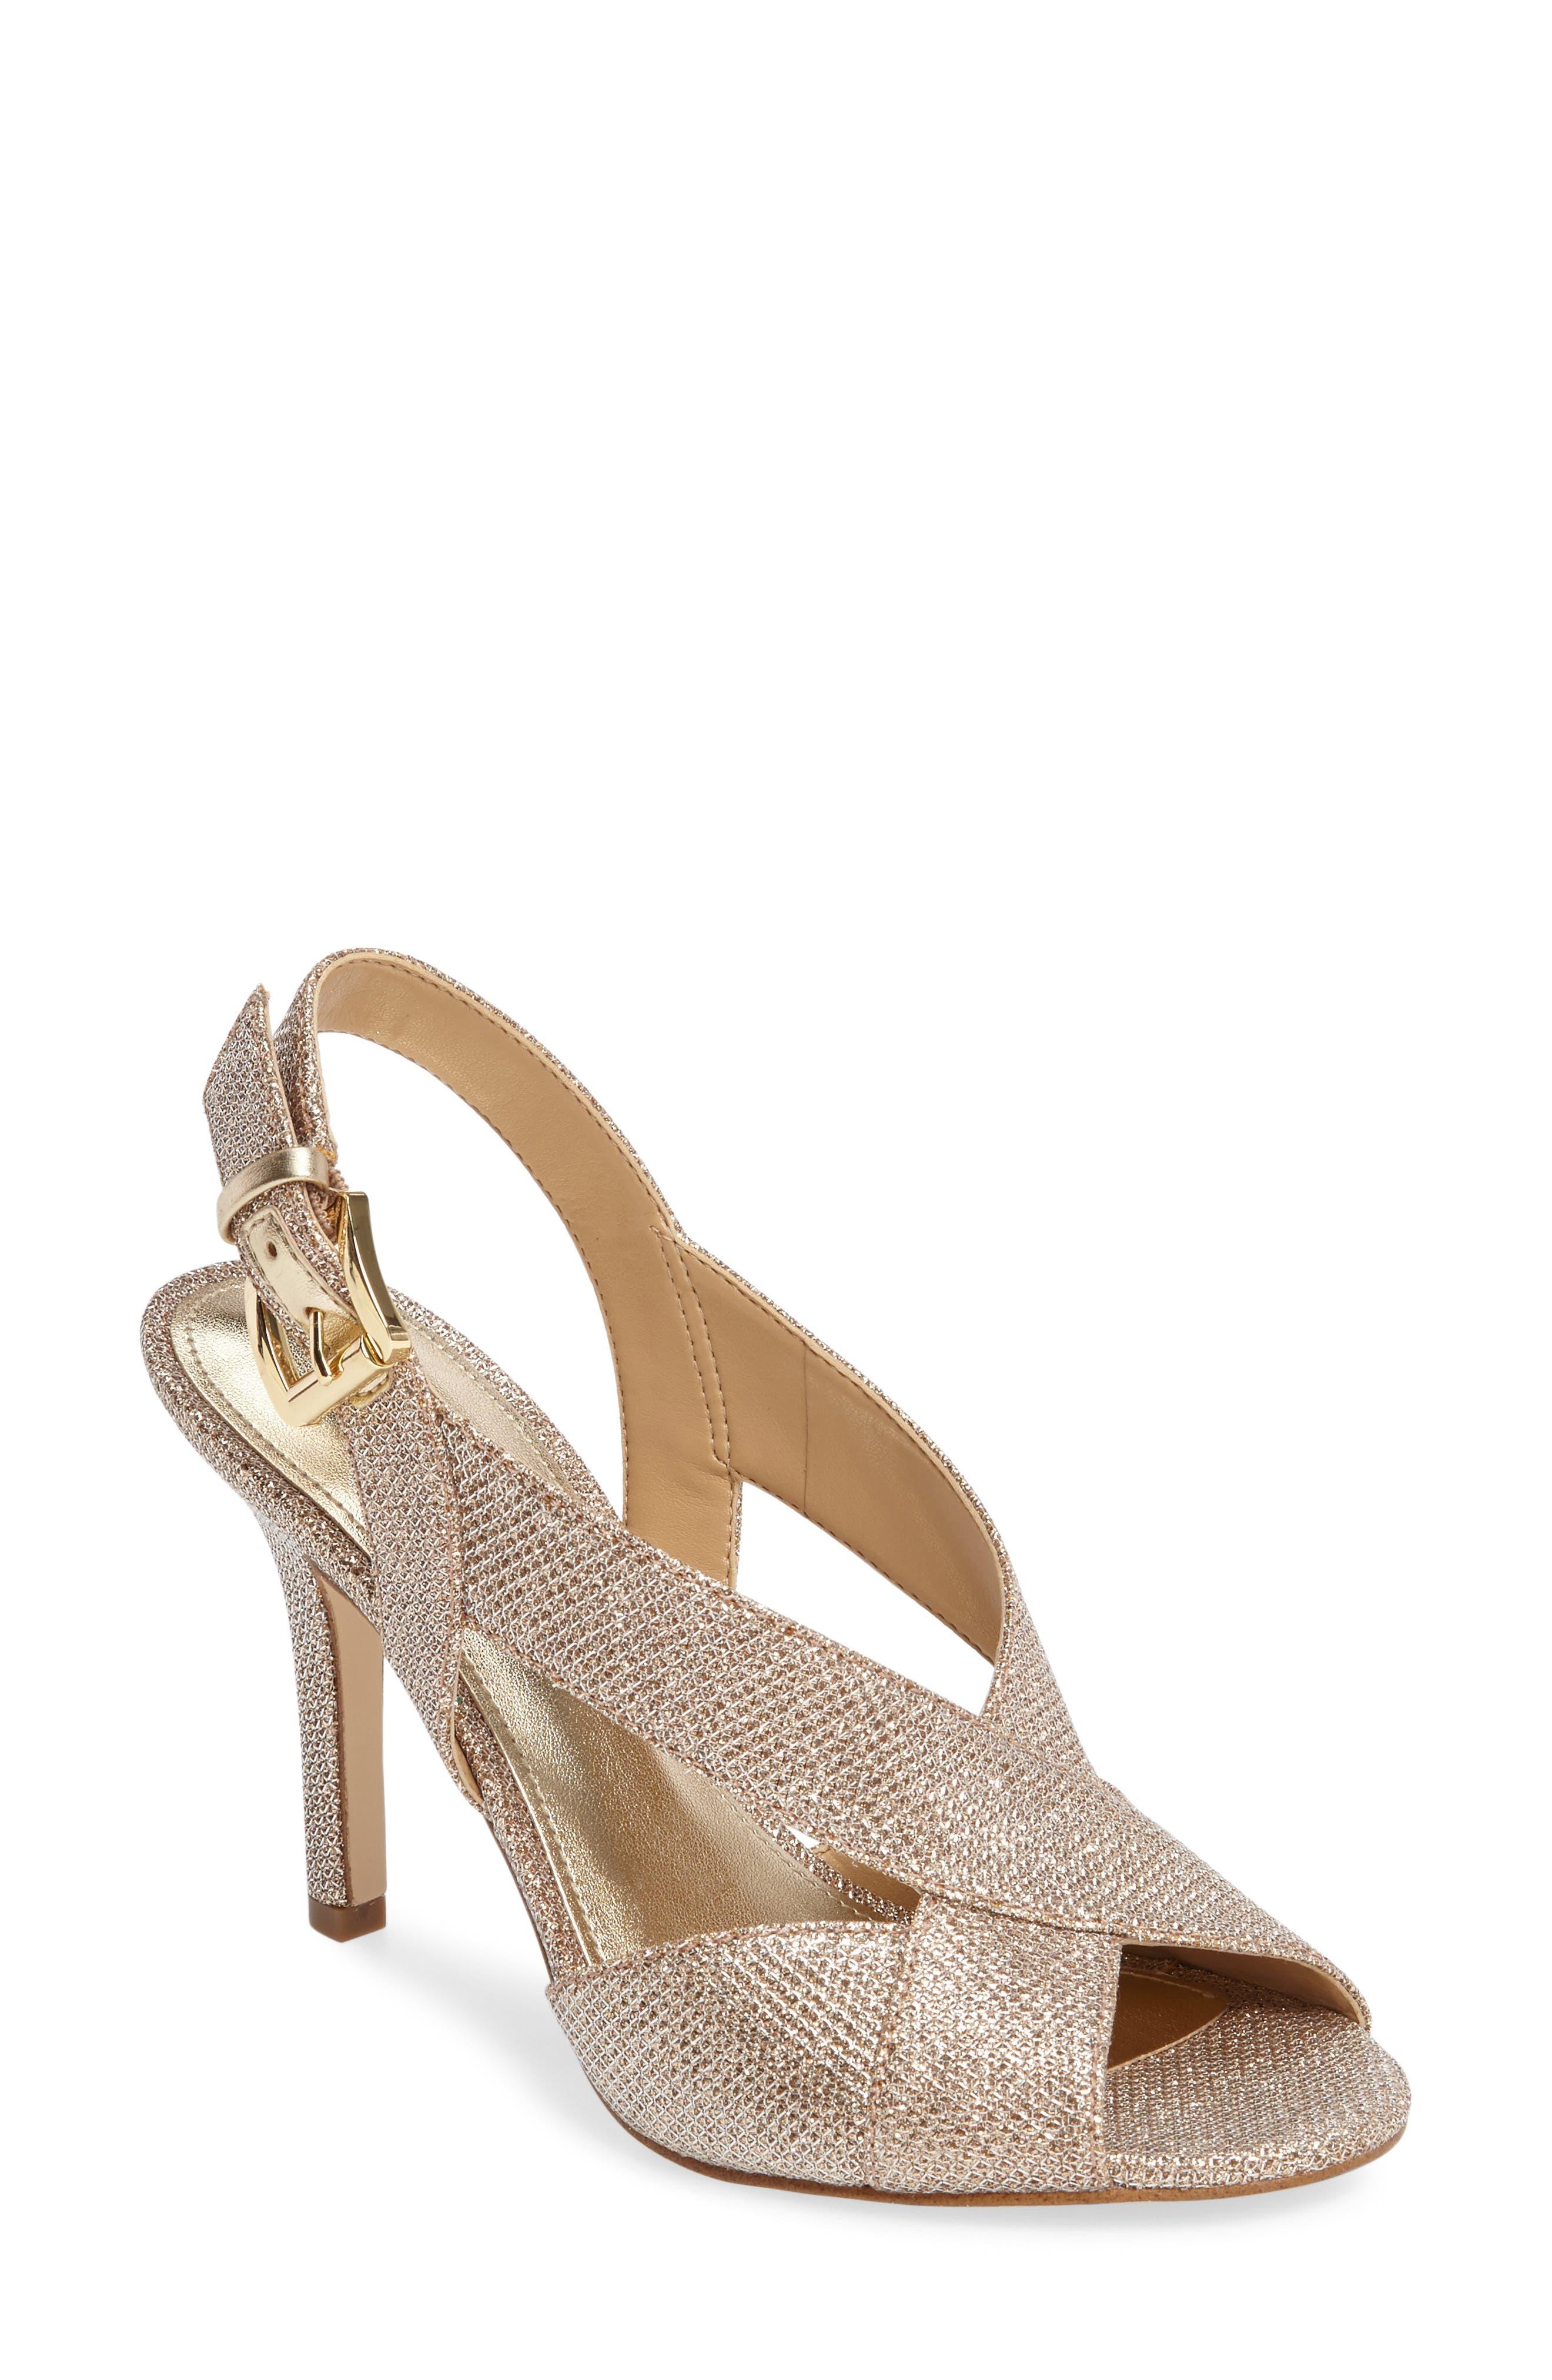 Becky Glitter Crisscross Slingback Sandals in White/ Silver/ Sand Suede